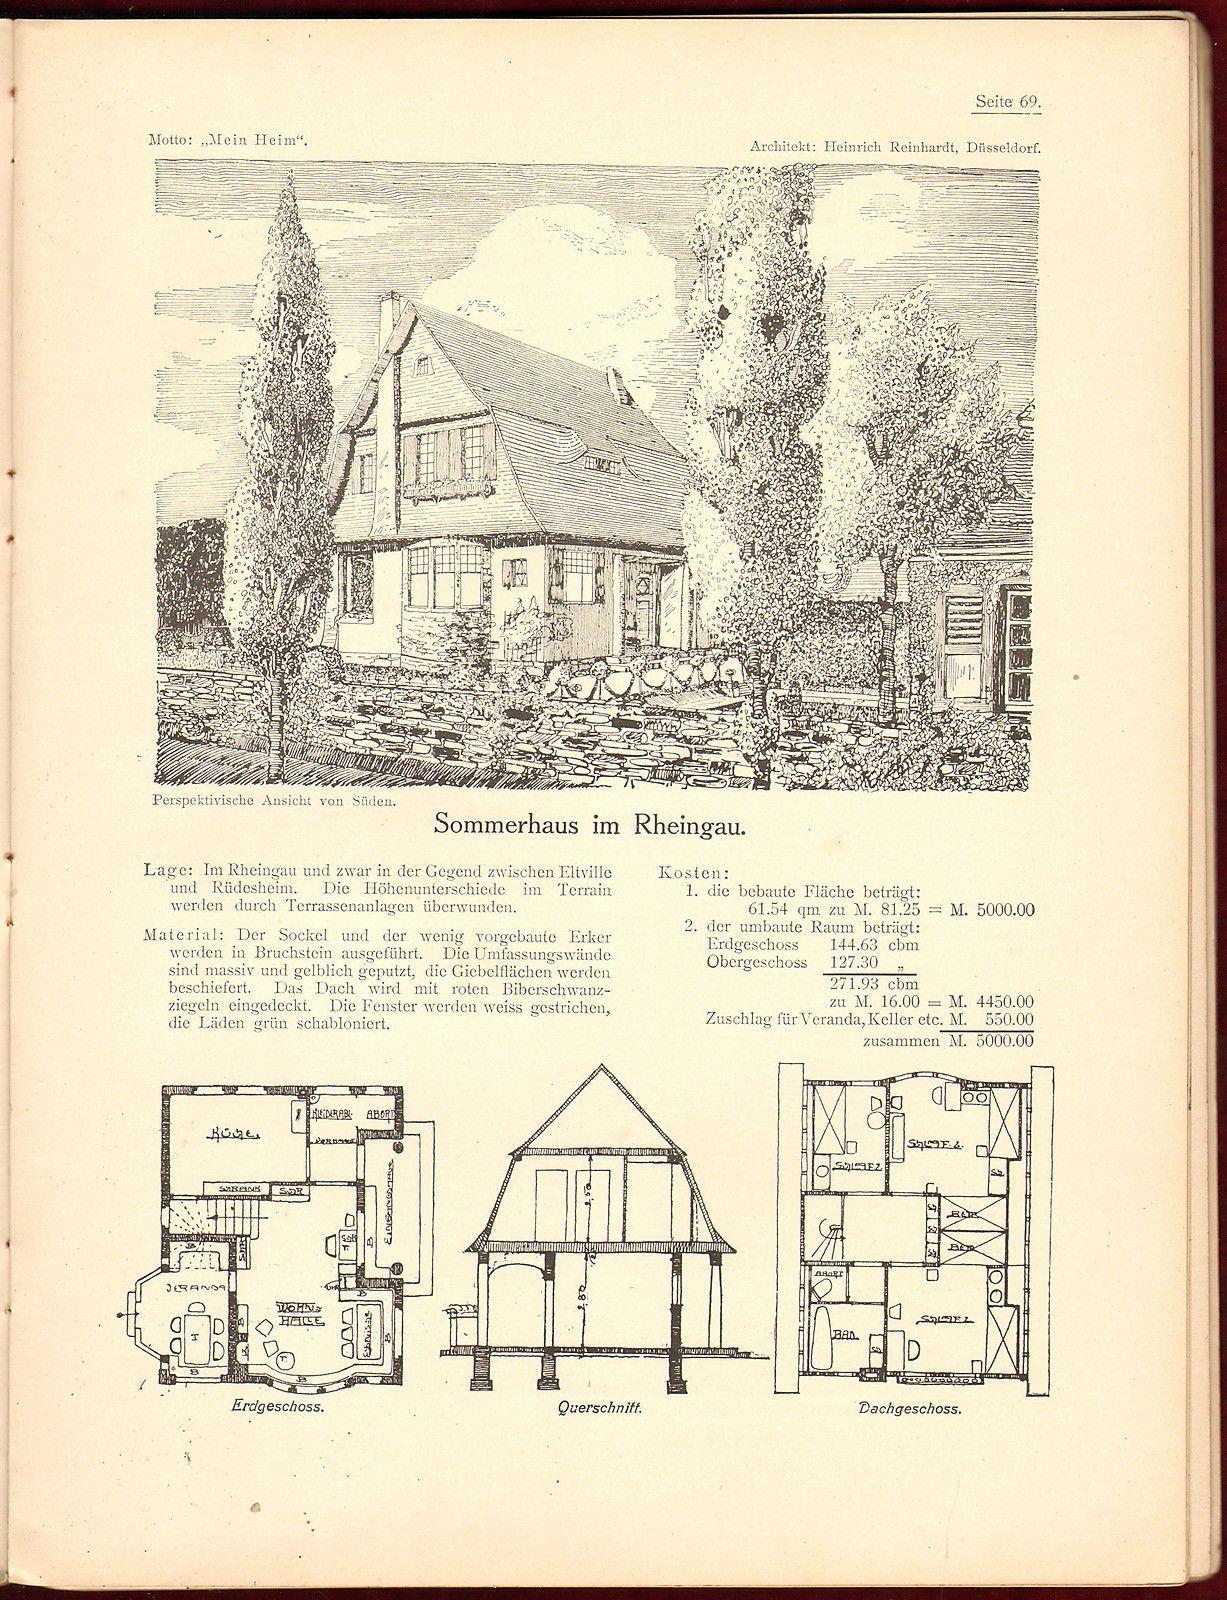 1907 Wettbewerb Woche Germany Architecture Design Vintage House Plan Art Photo Vintage House Plans House Plans Vintage House